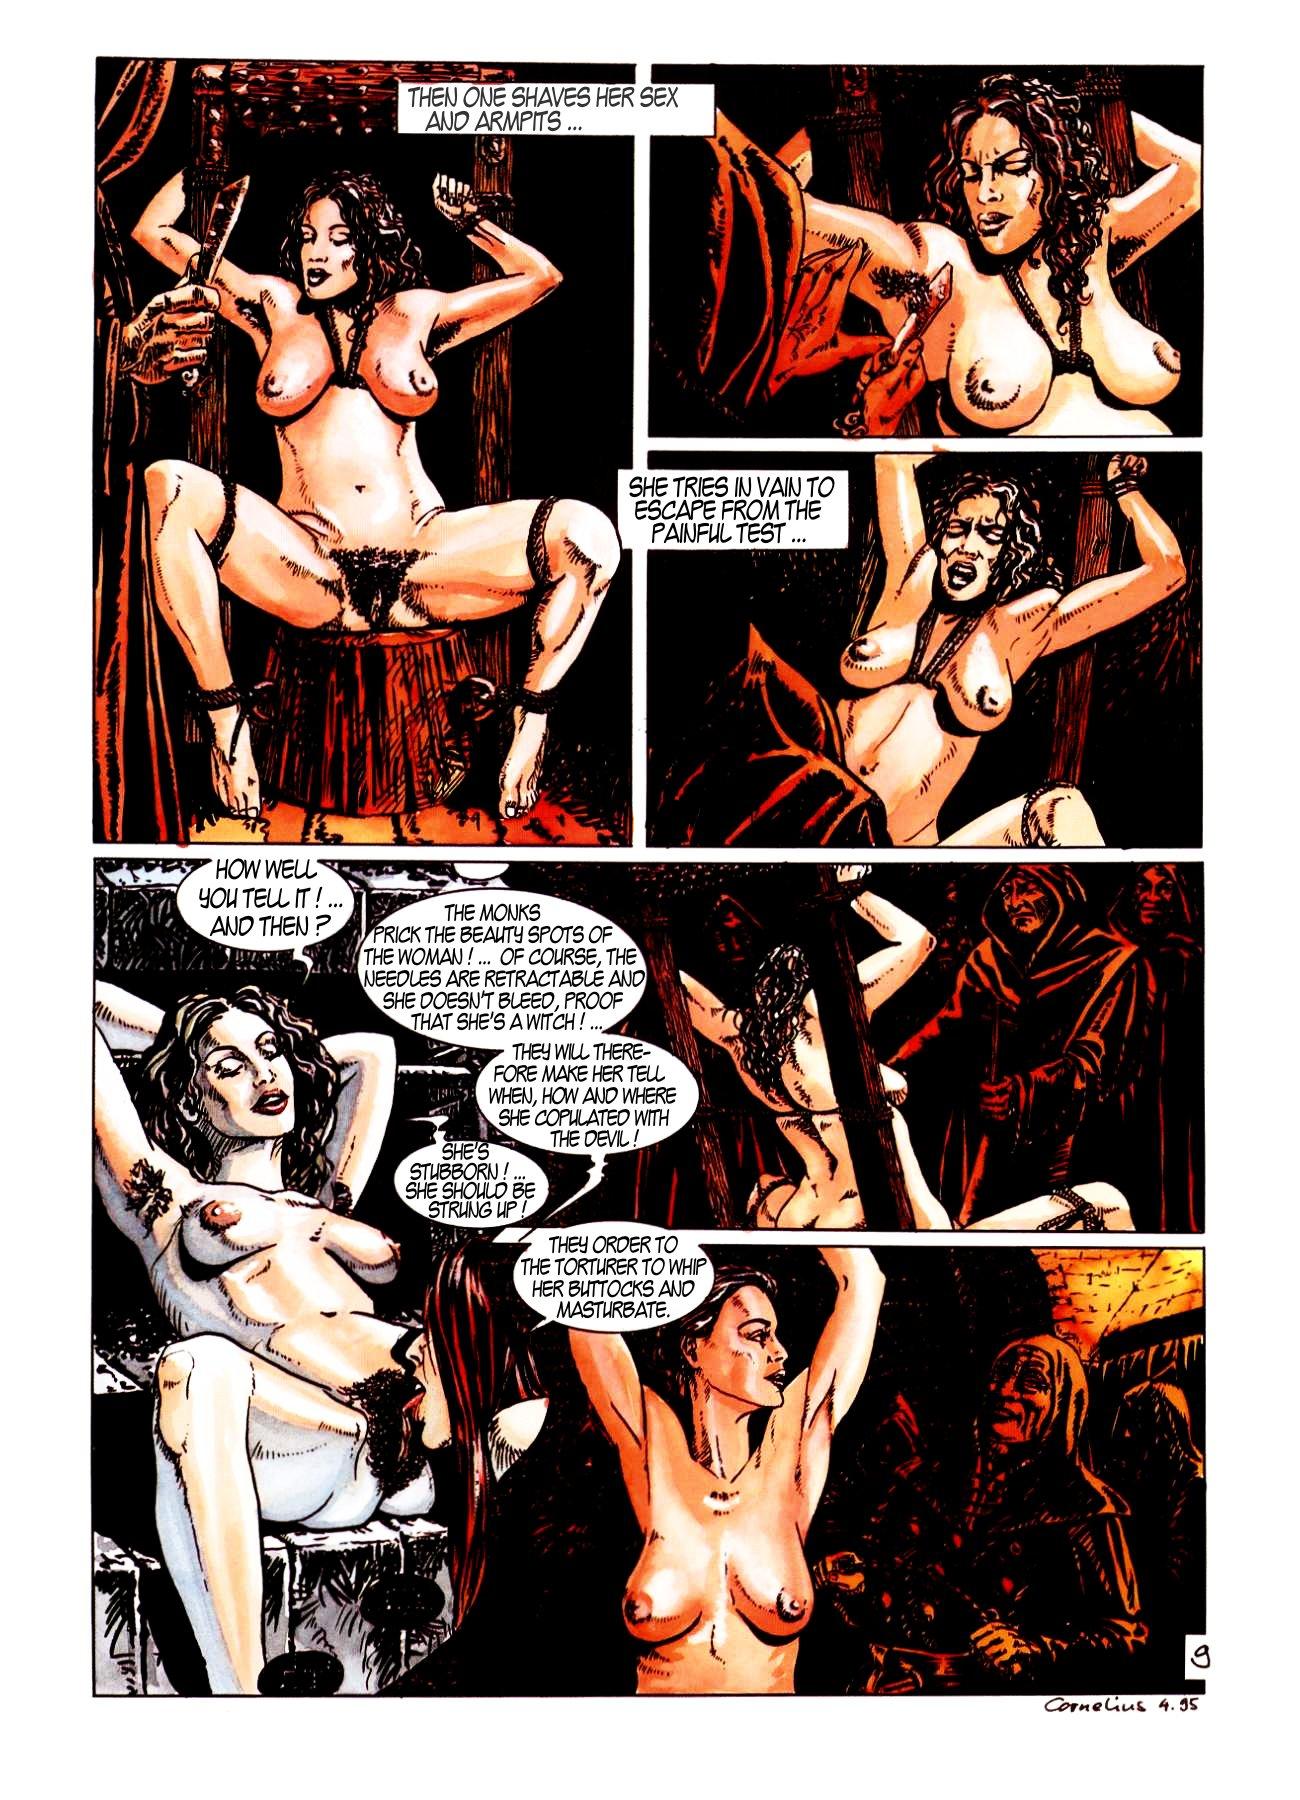 Секс фэнтези комикс 6 фотография